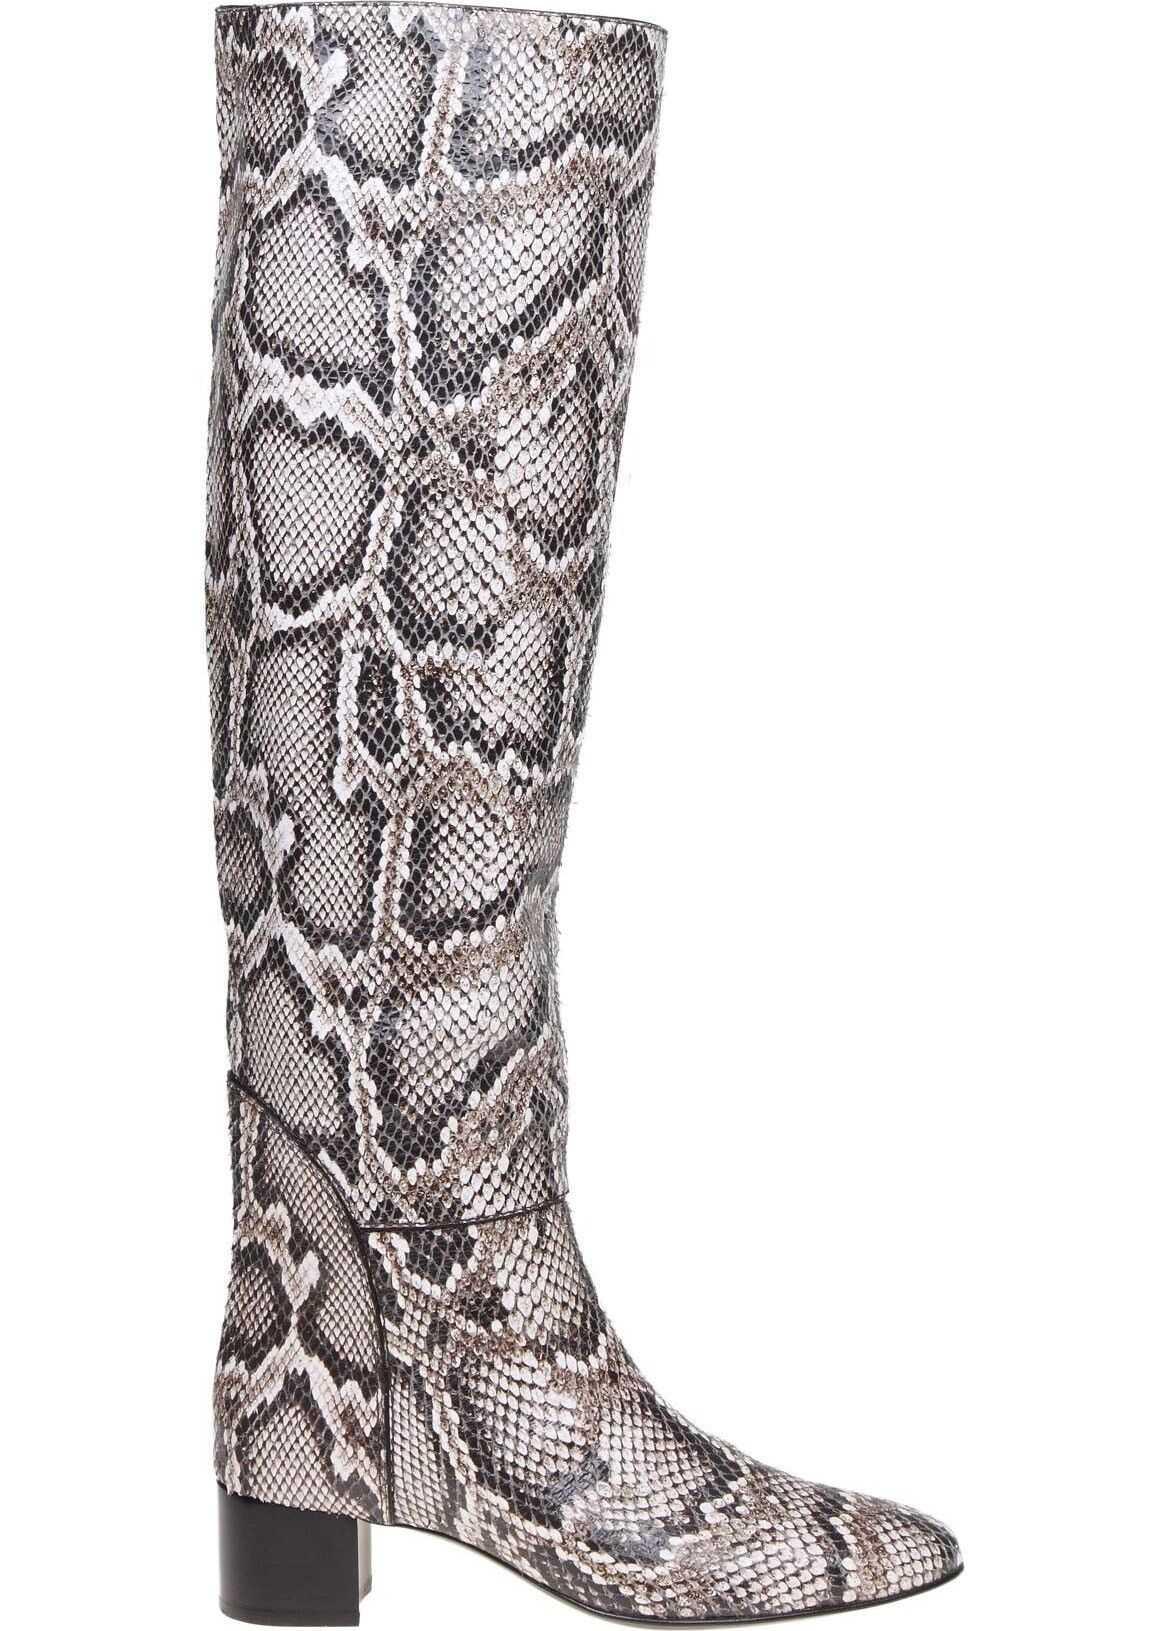 Giuseppe Zanotti Leather Boots GREY